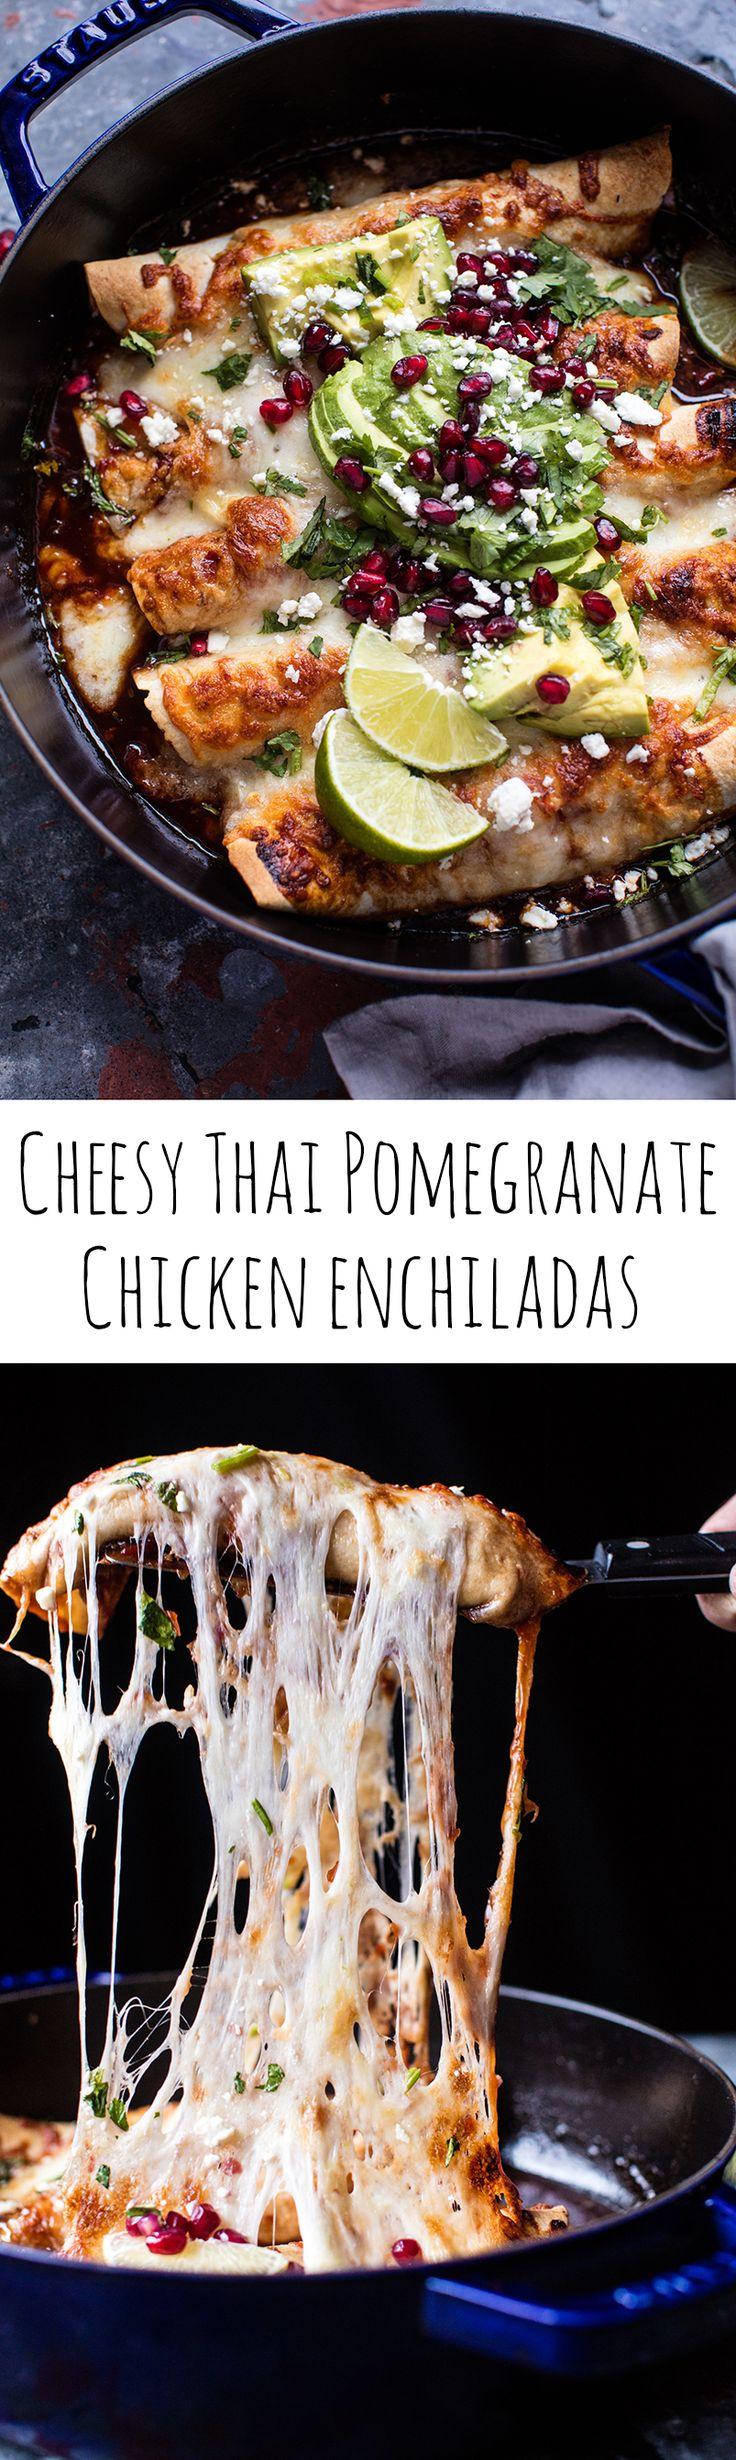 Cheesy Sweet and Sour Pomegranate Thai Chicken Enchiladas | halfbakedharvest.com @hbharvest